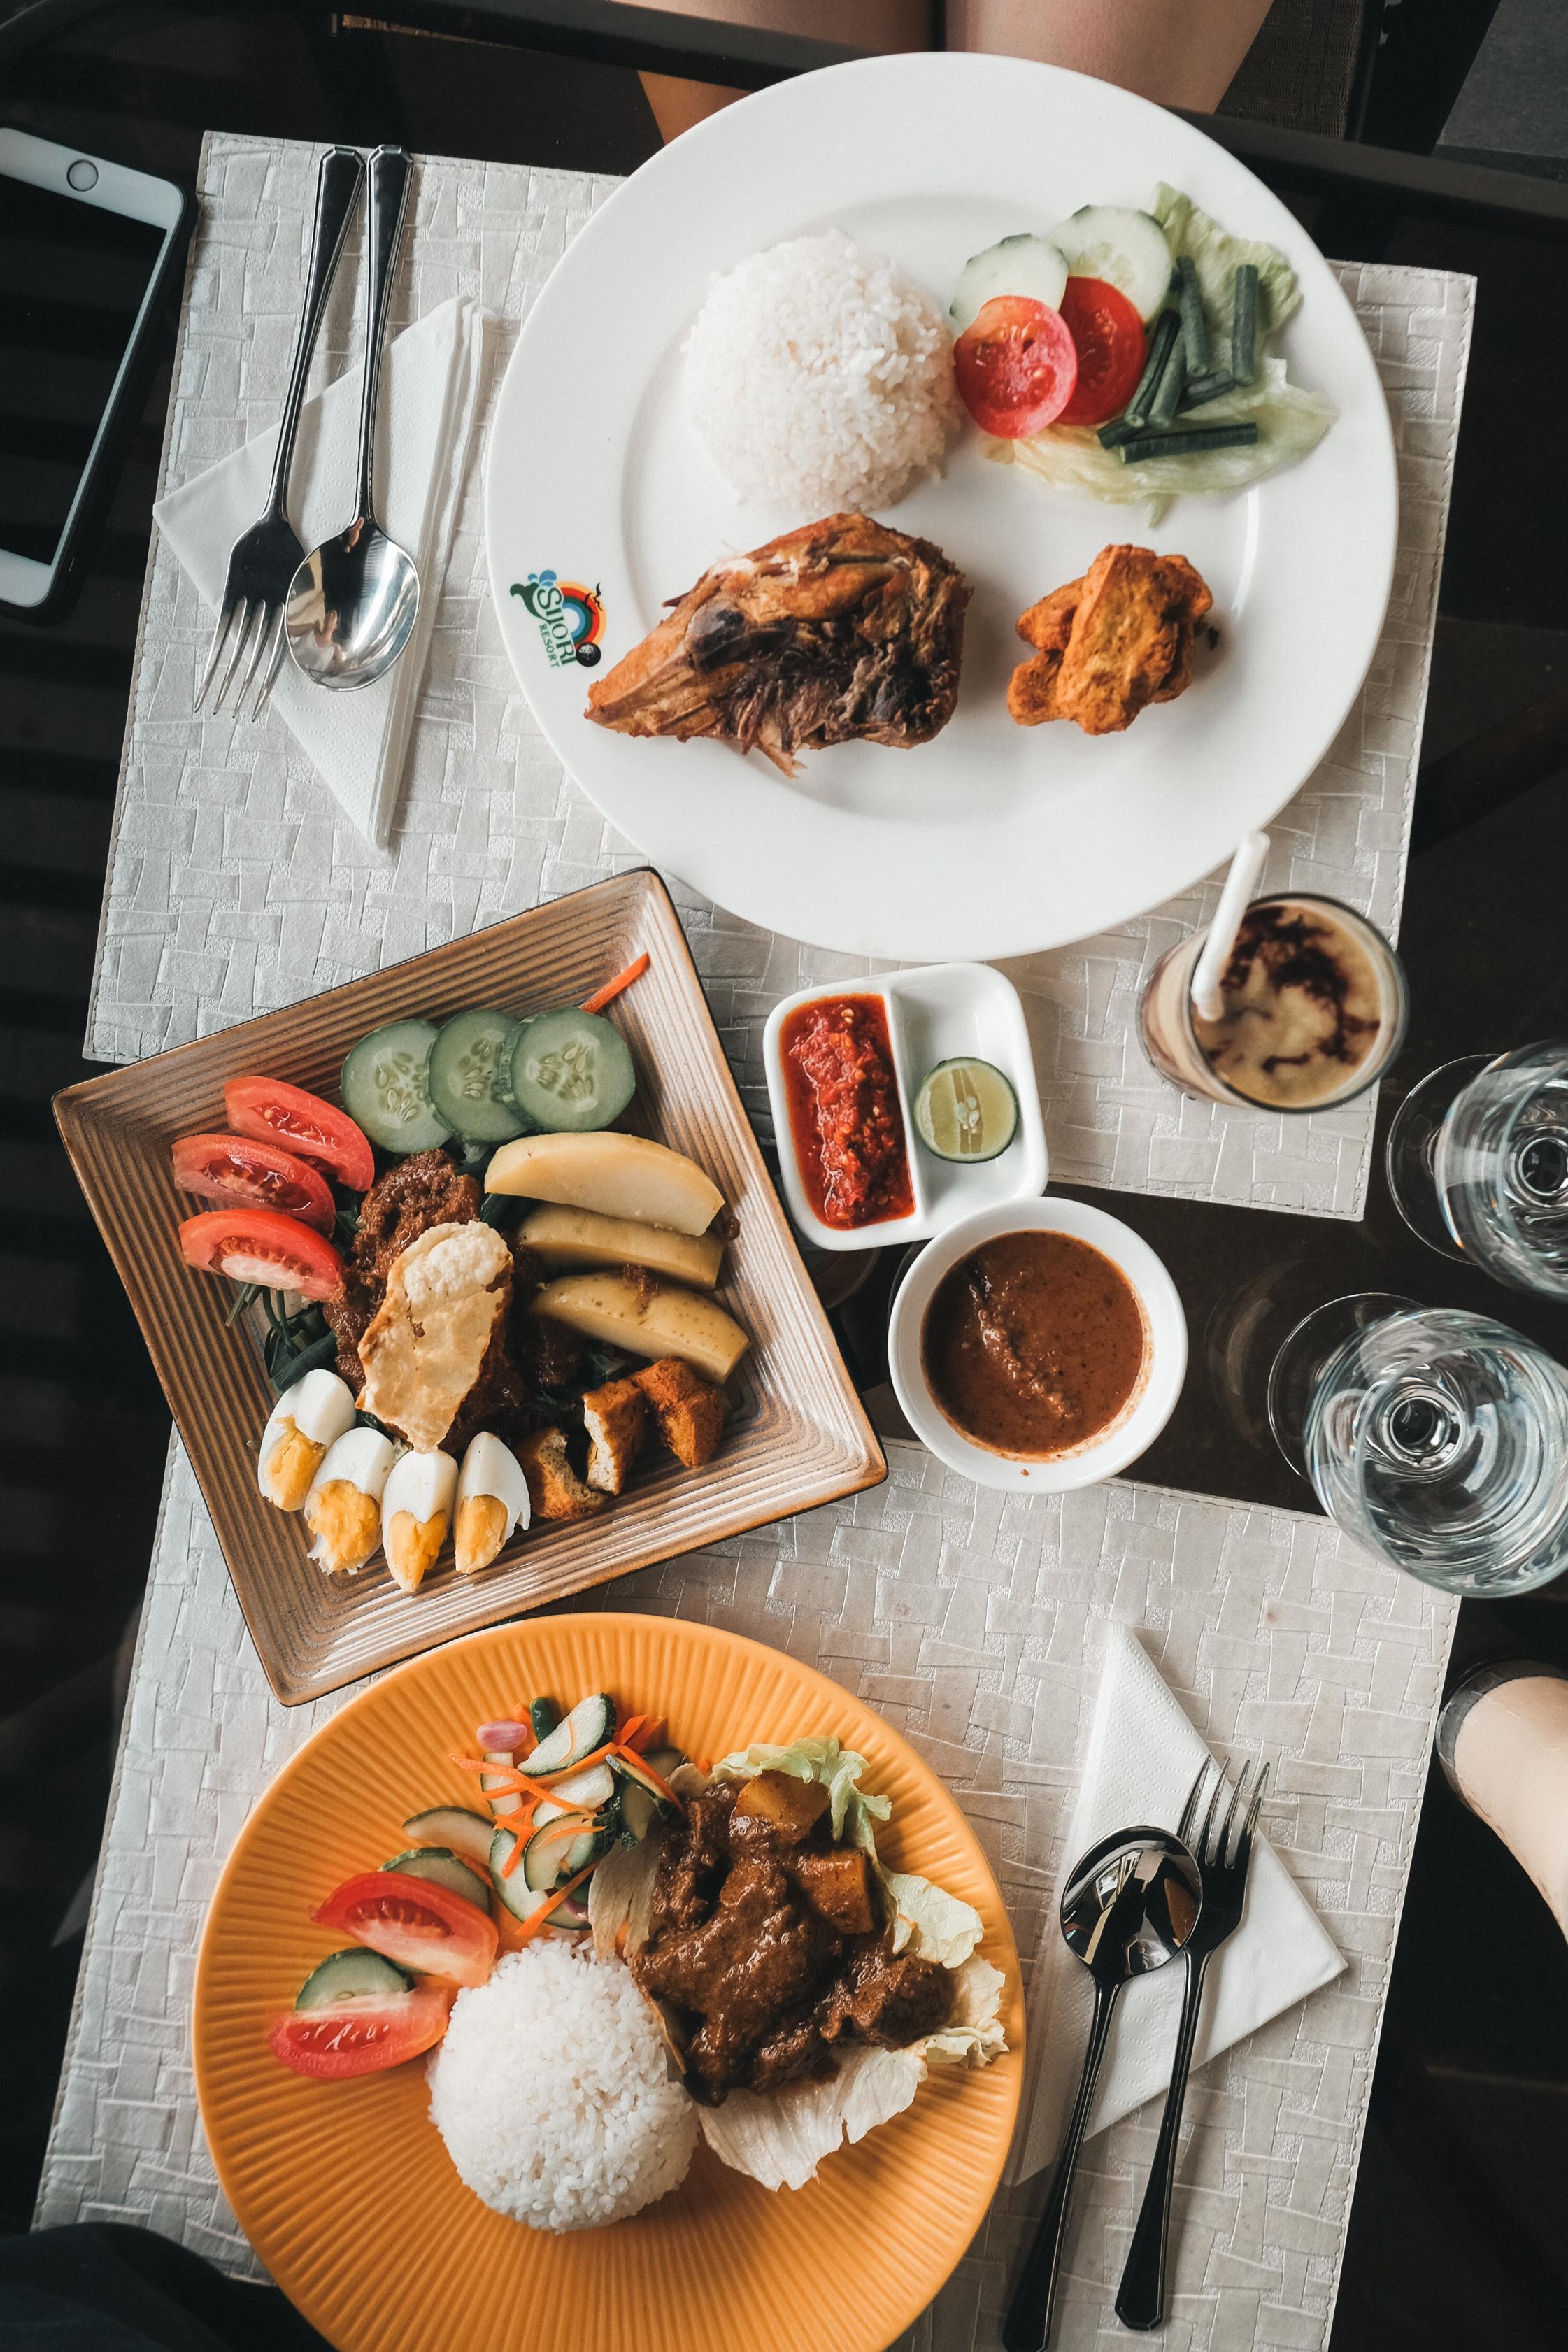 From top to bottom: Ayam Penyet, Avocado Juice (Alpukat), Gado Gado, Beef Rendang